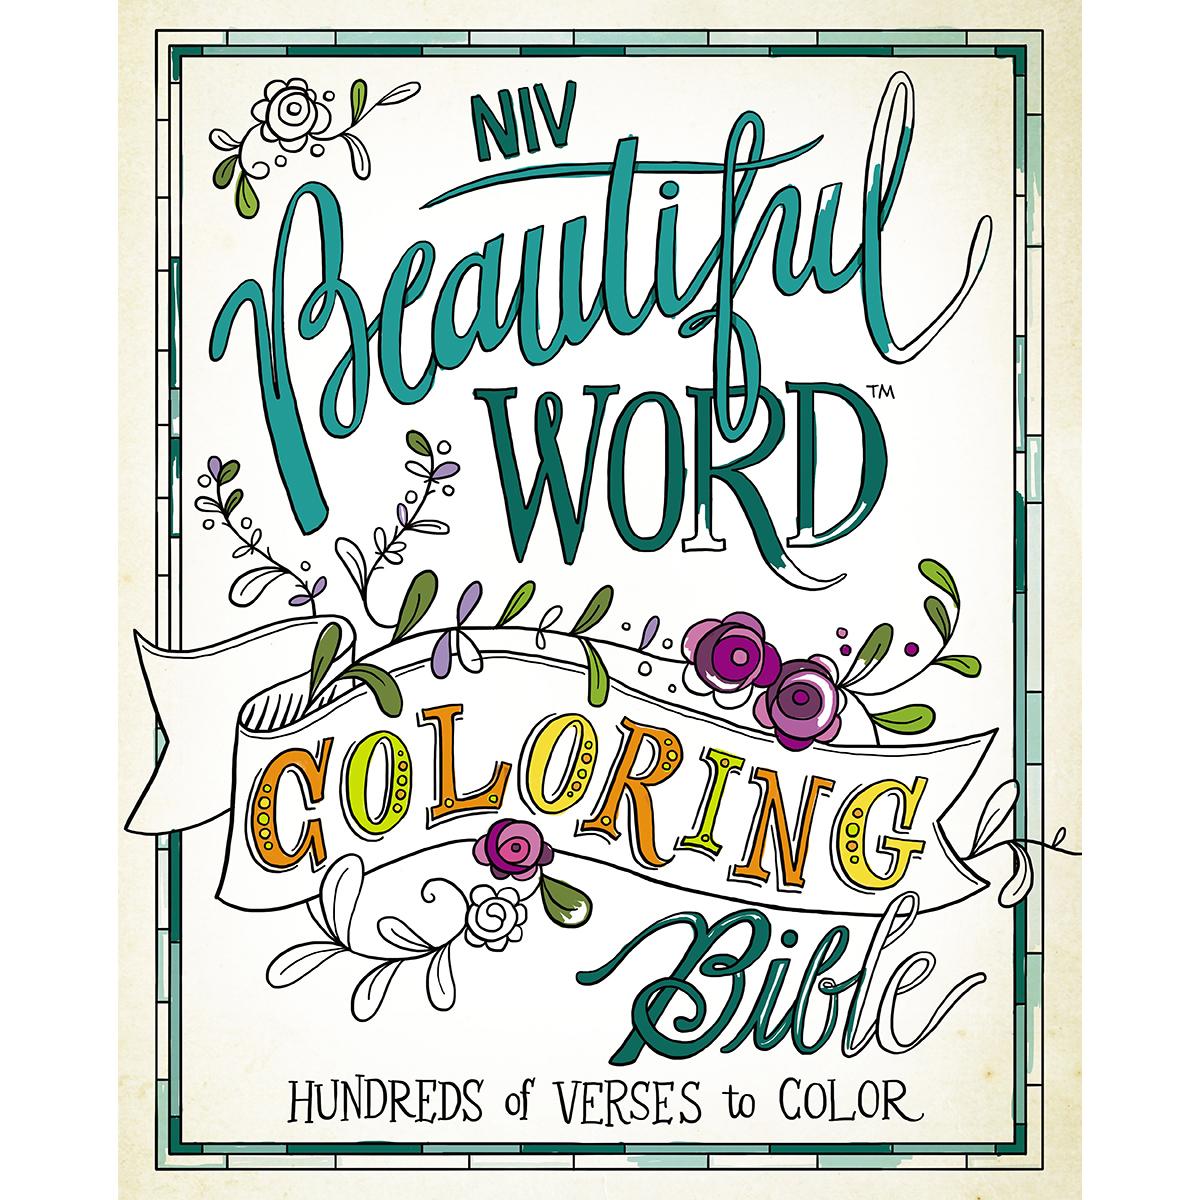 BEAUT WORD-NIV COLORING BIBLE